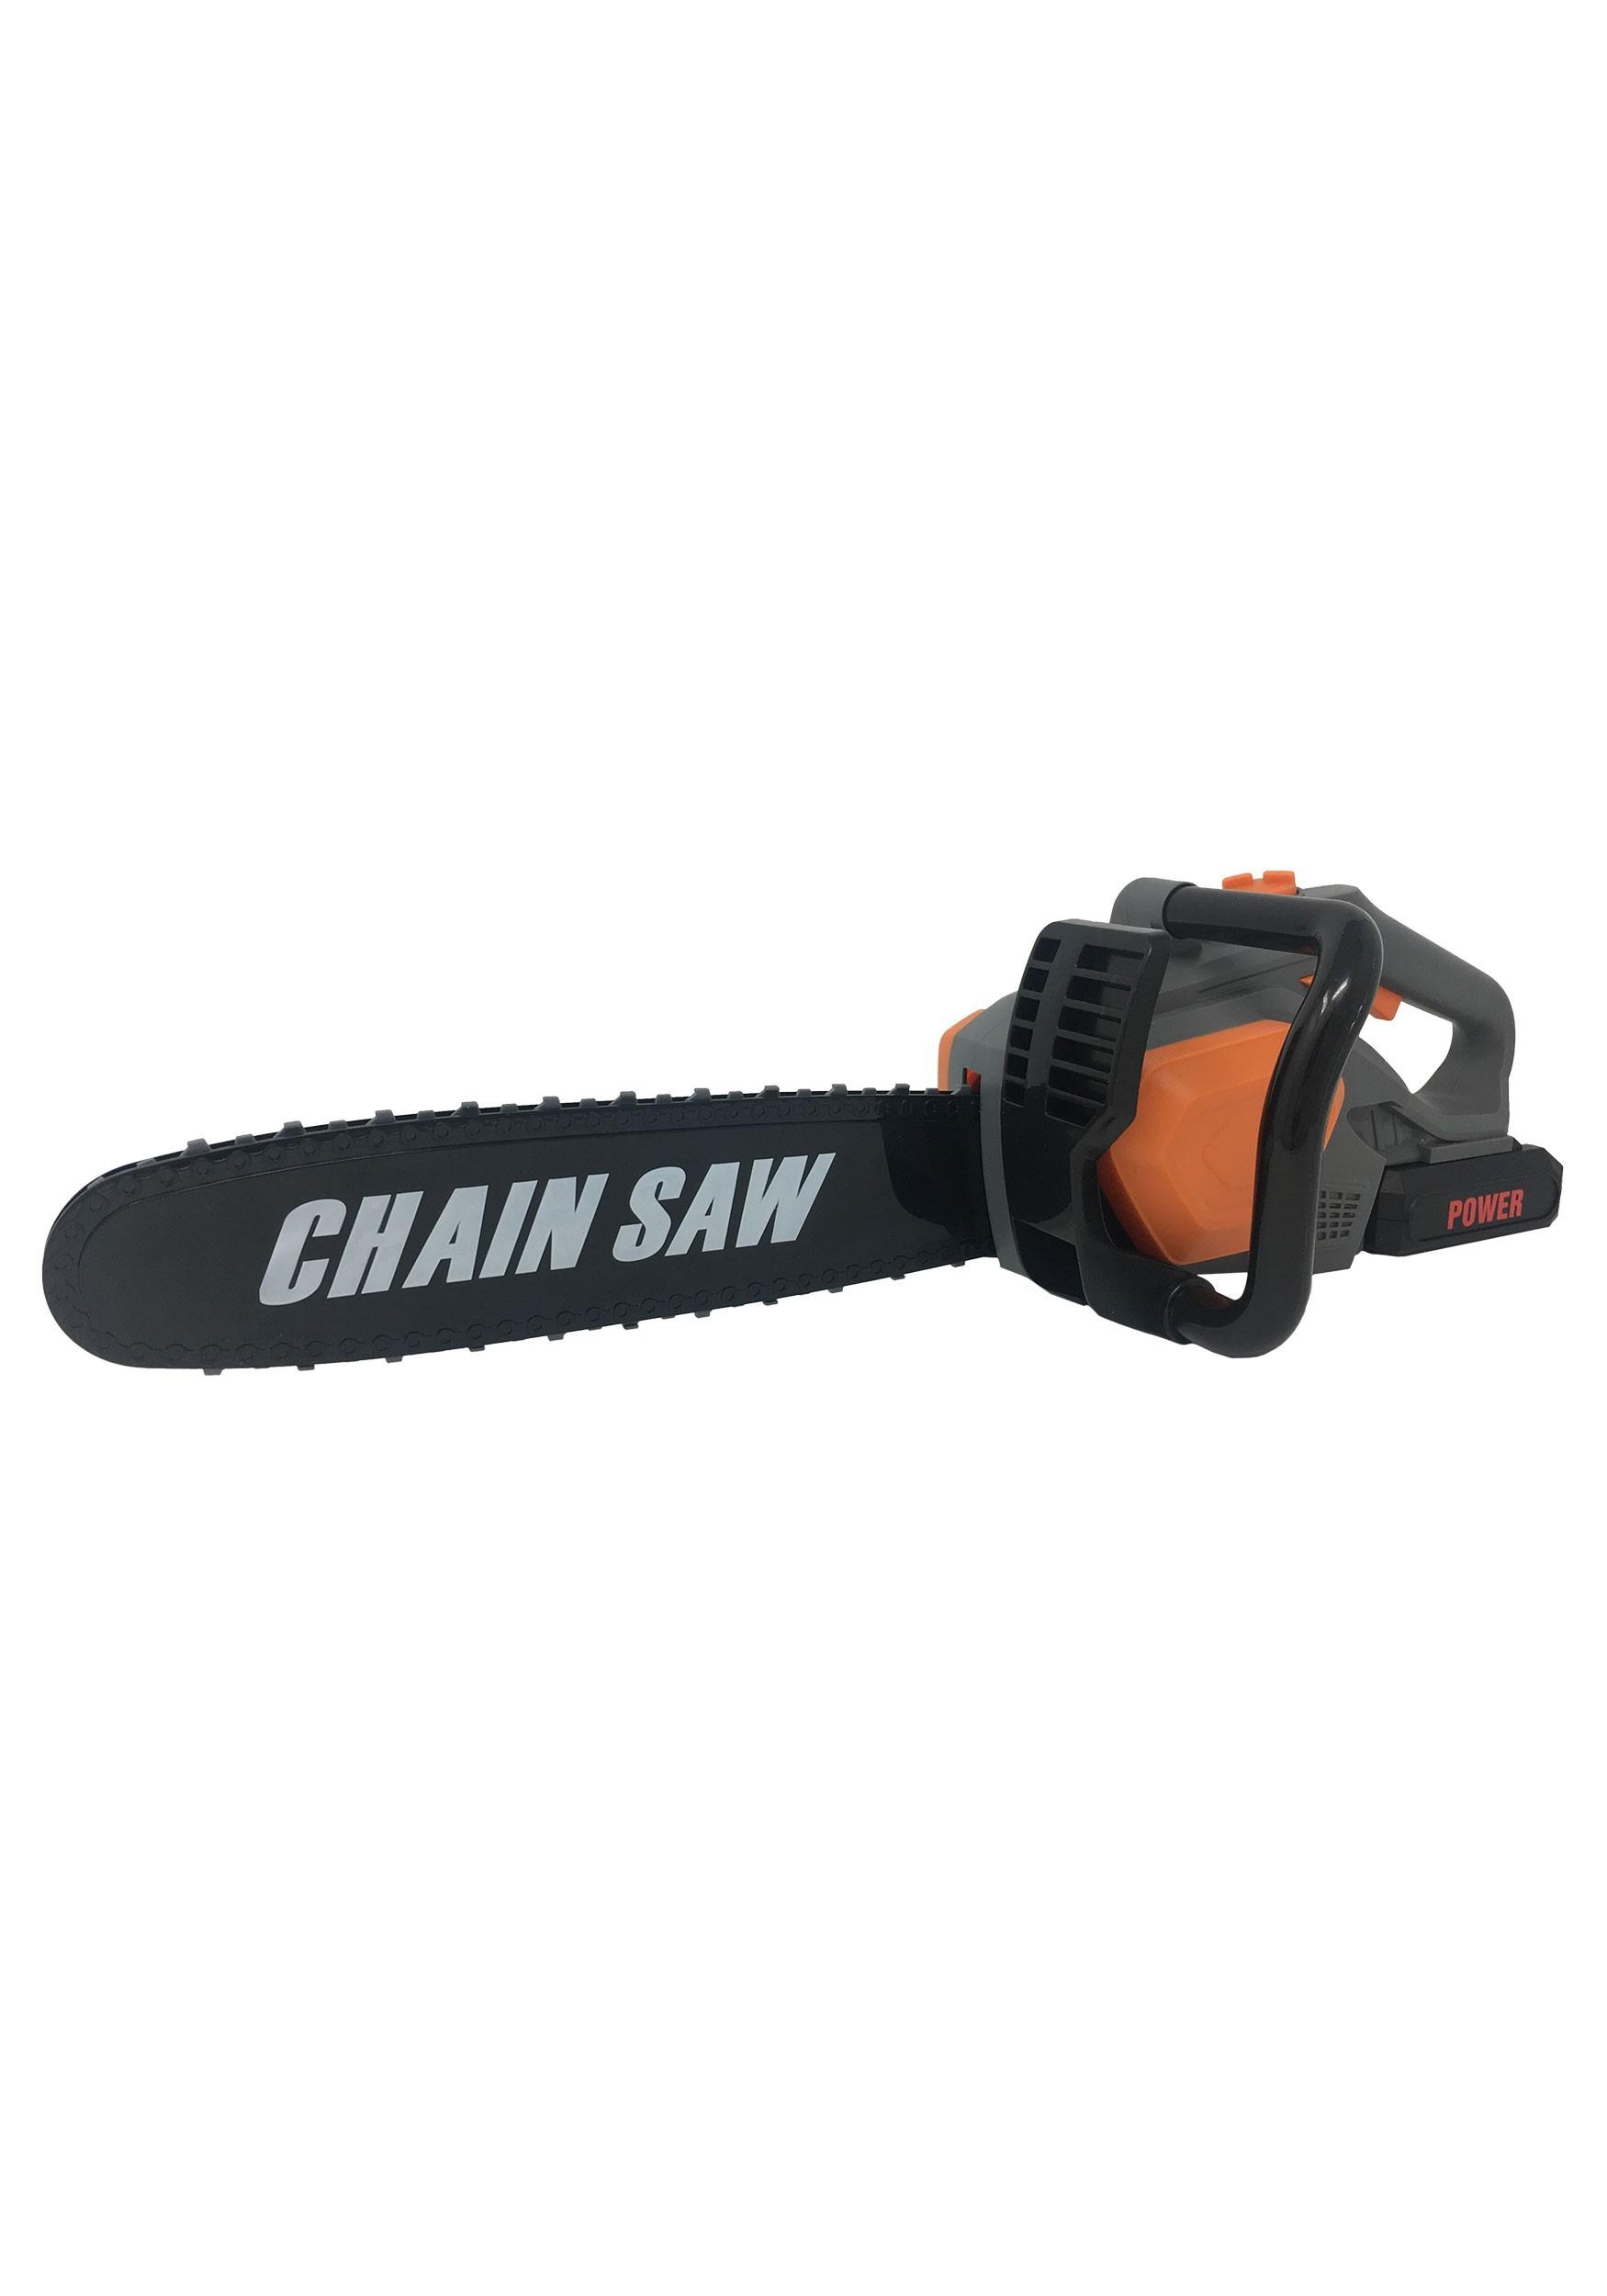 Power Toy Chainsaw